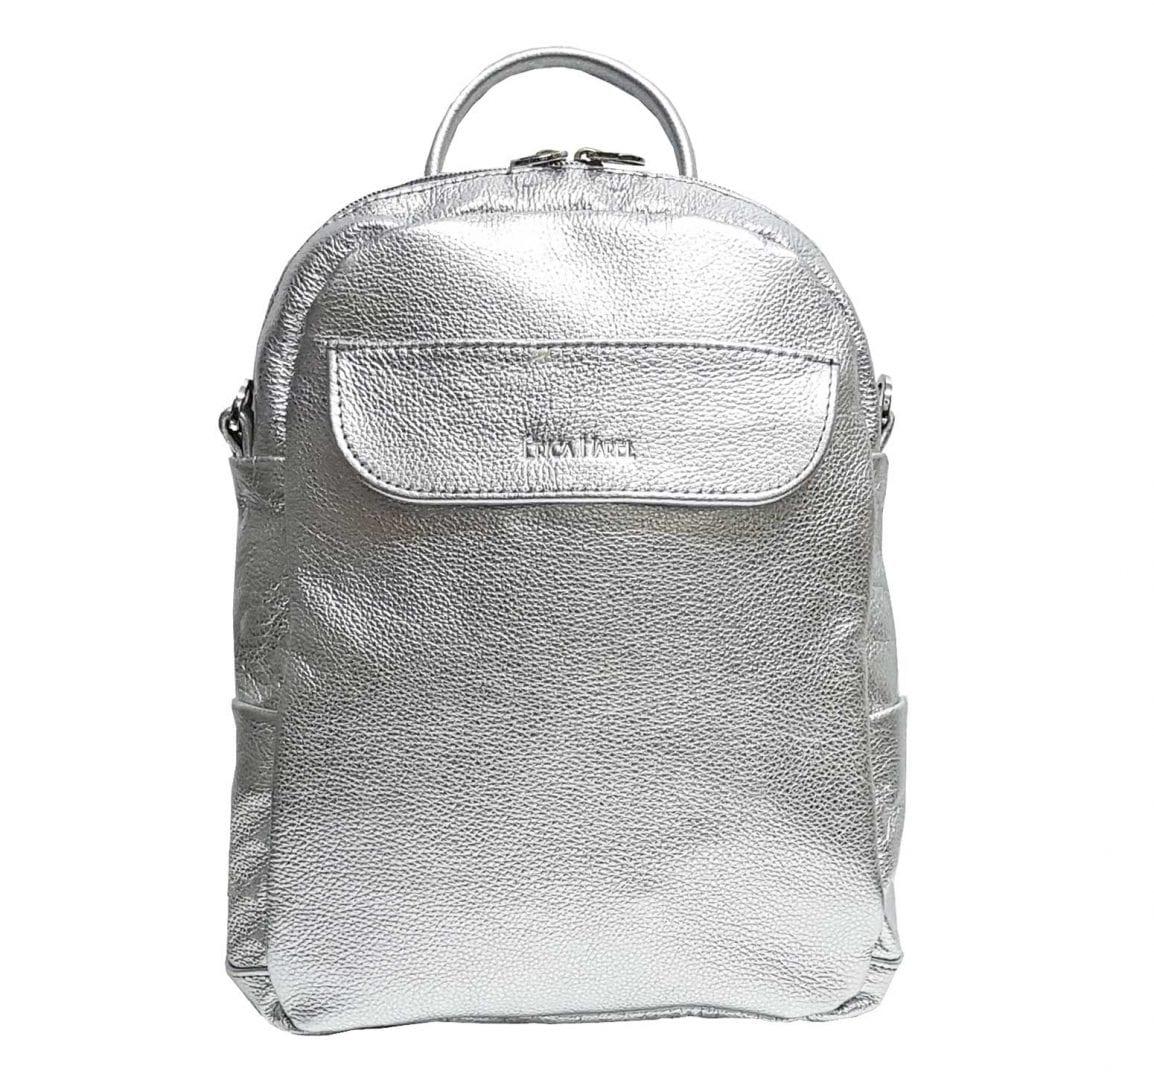 5f39a2a3b12653 Silver Leather Mini Backpack Crossbody